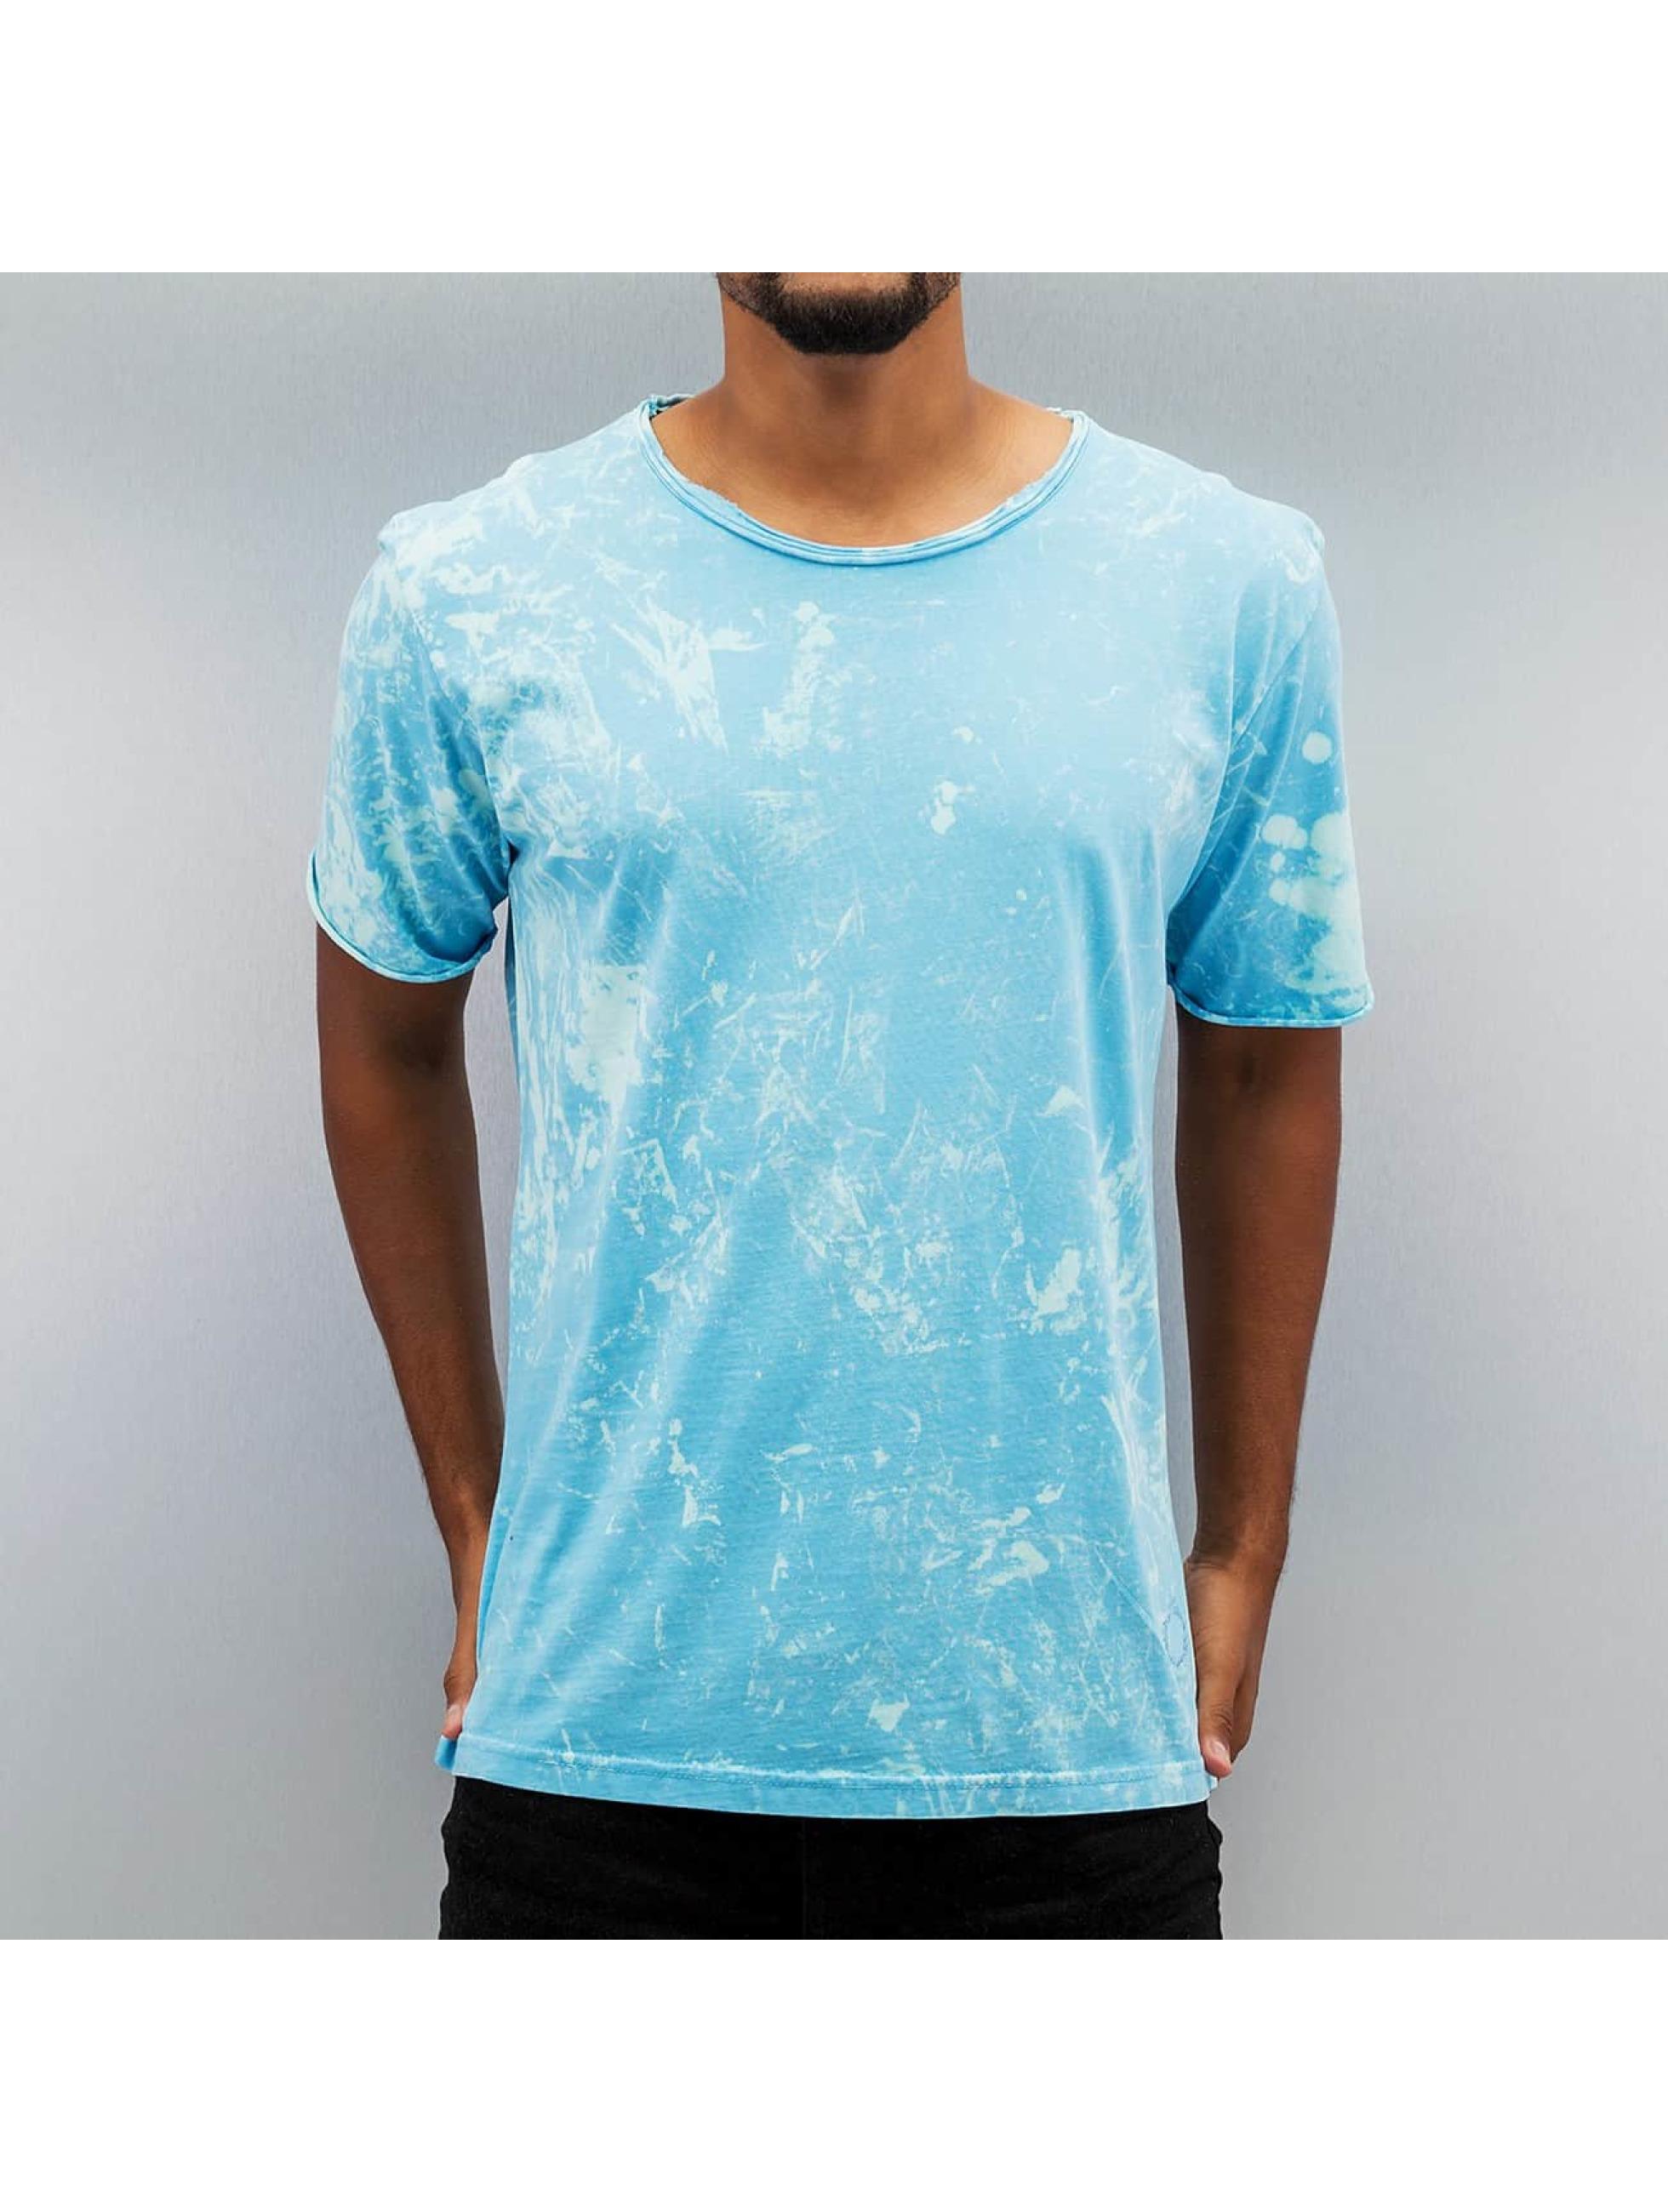 Yezz Männer T-Shirt Acid in blau